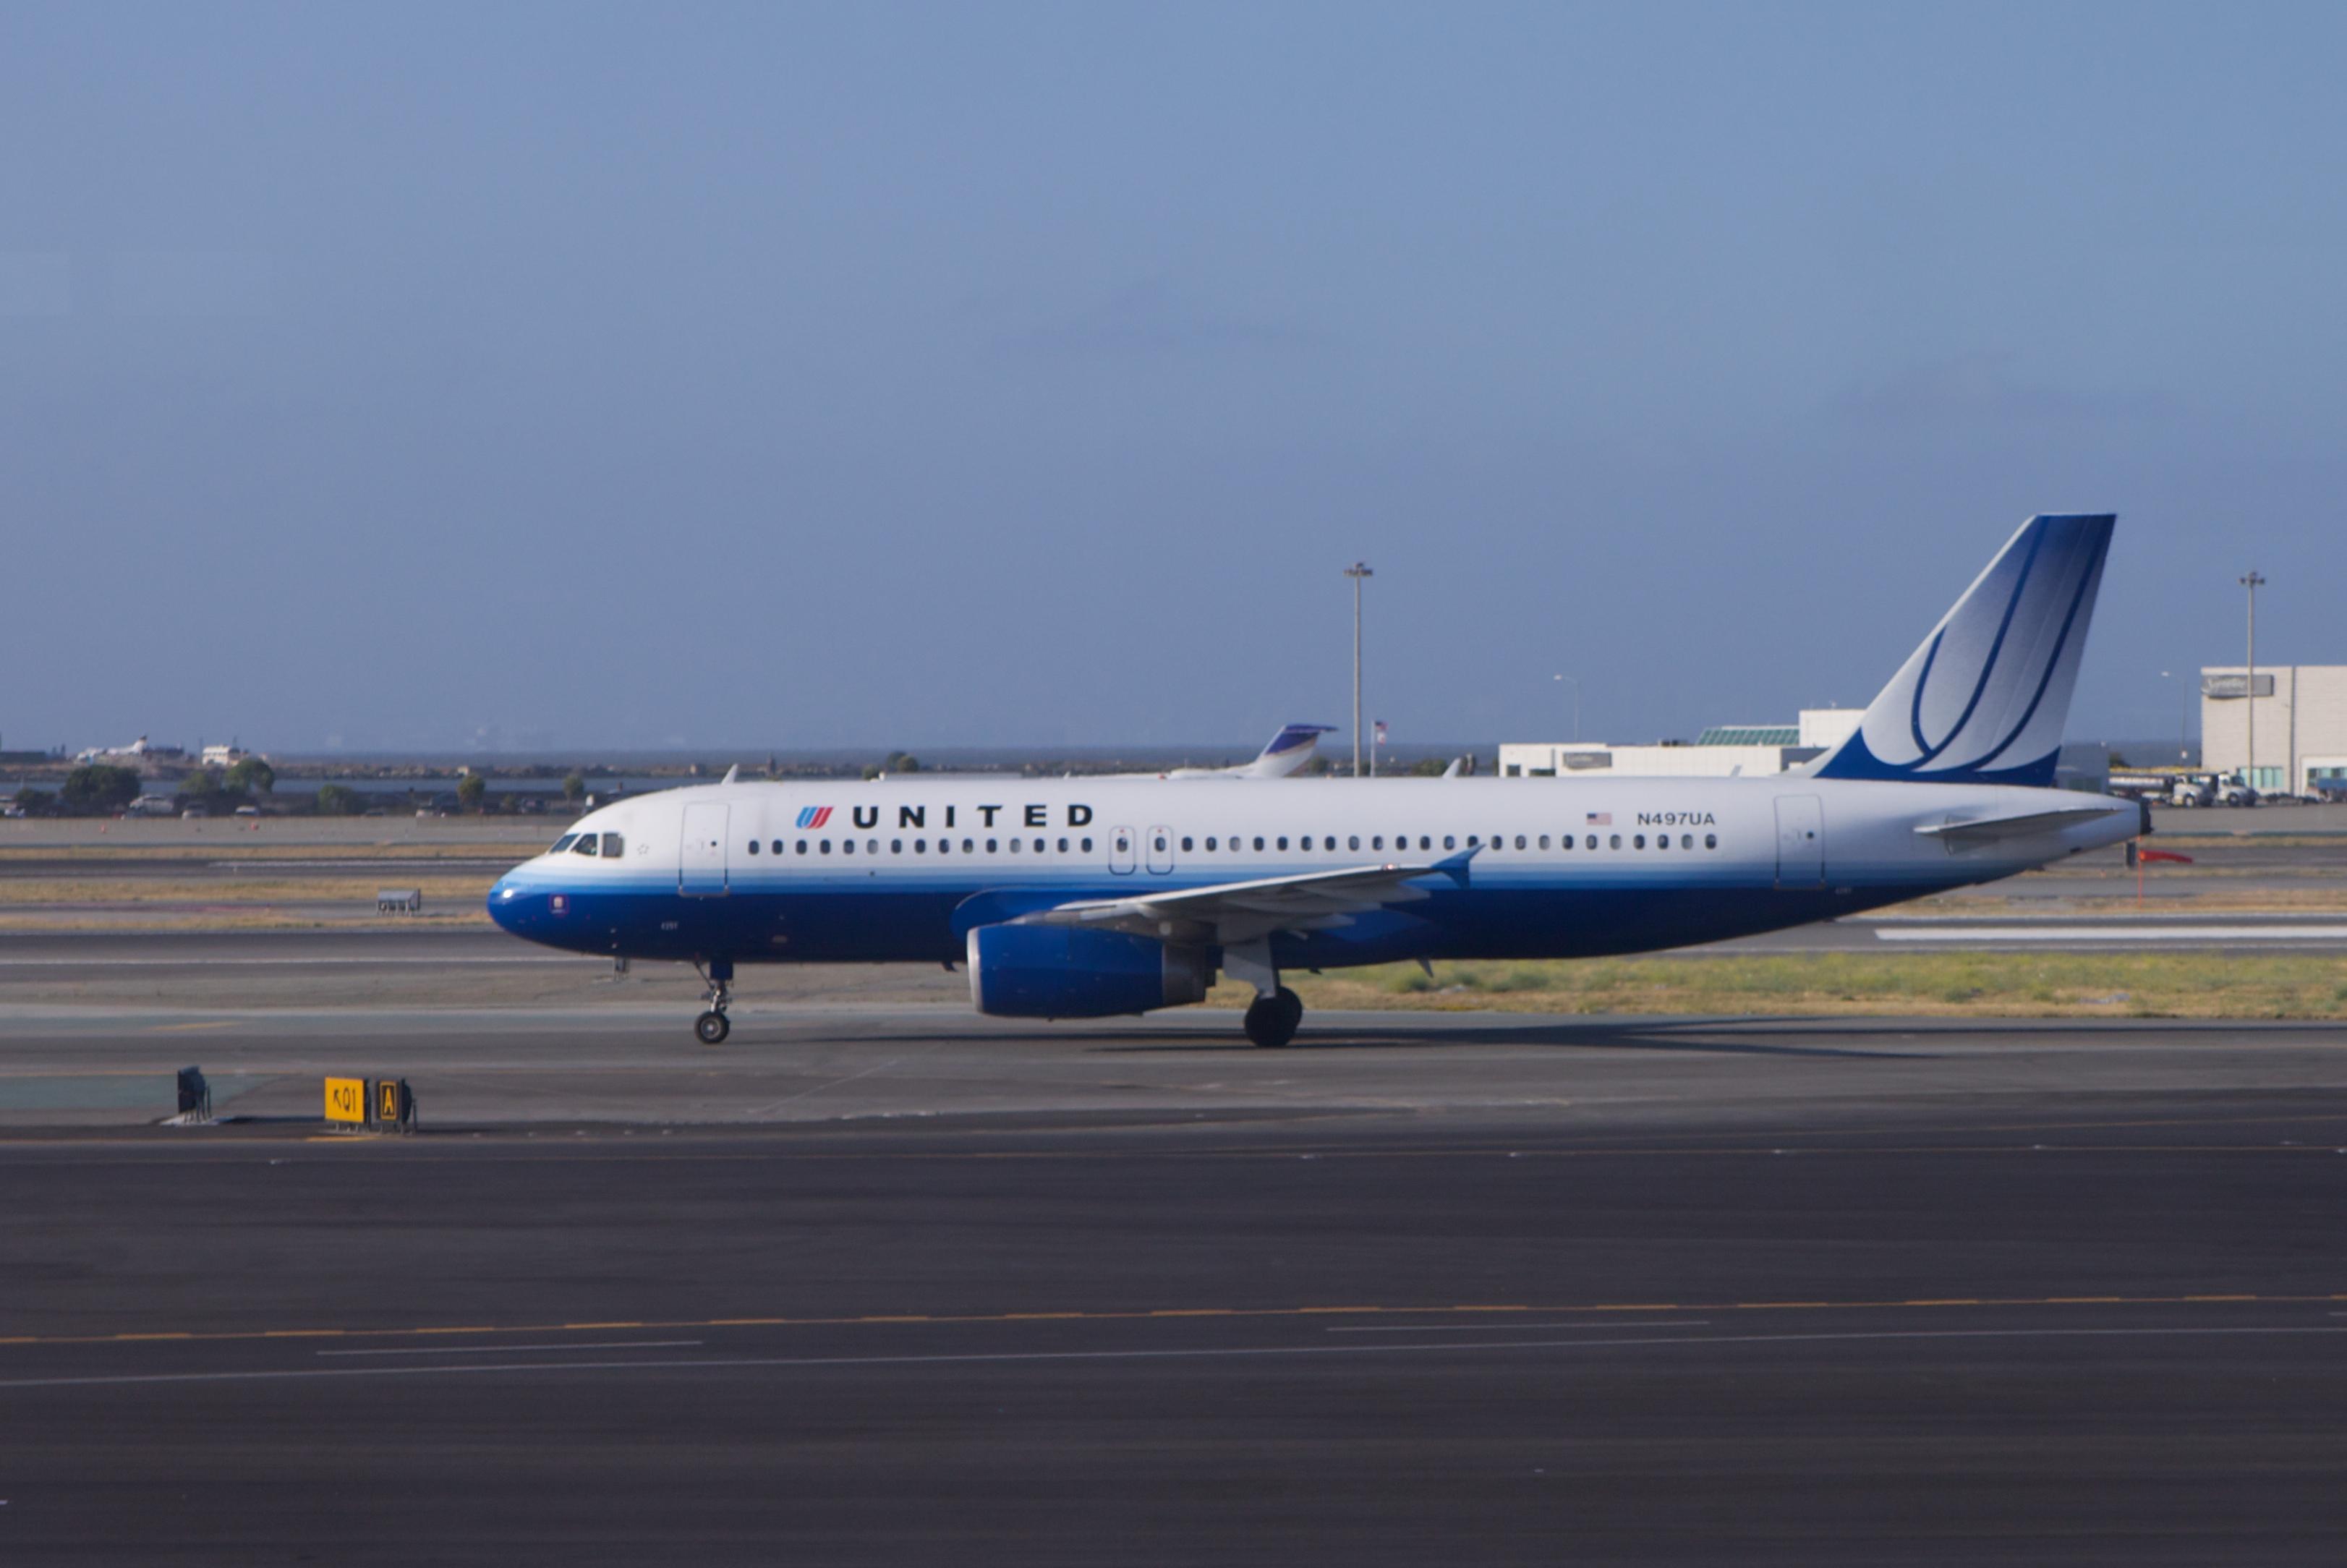 File:United Airbus A320.jpg - Wikimedia Commons